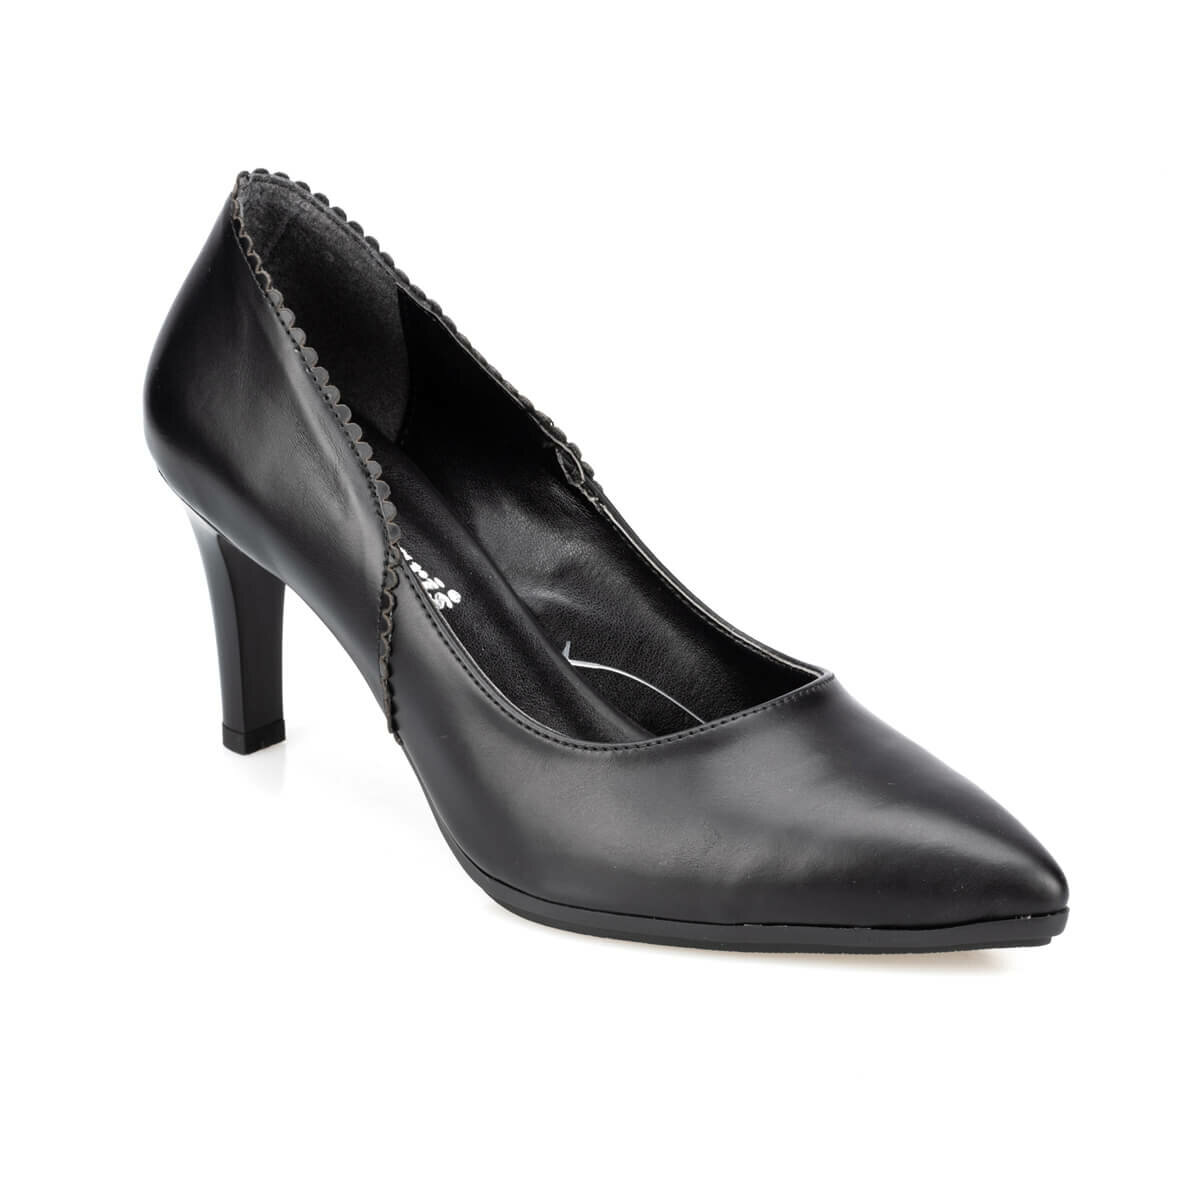 FLO 91.313134.Z Black Women Gova Shoes Polaris